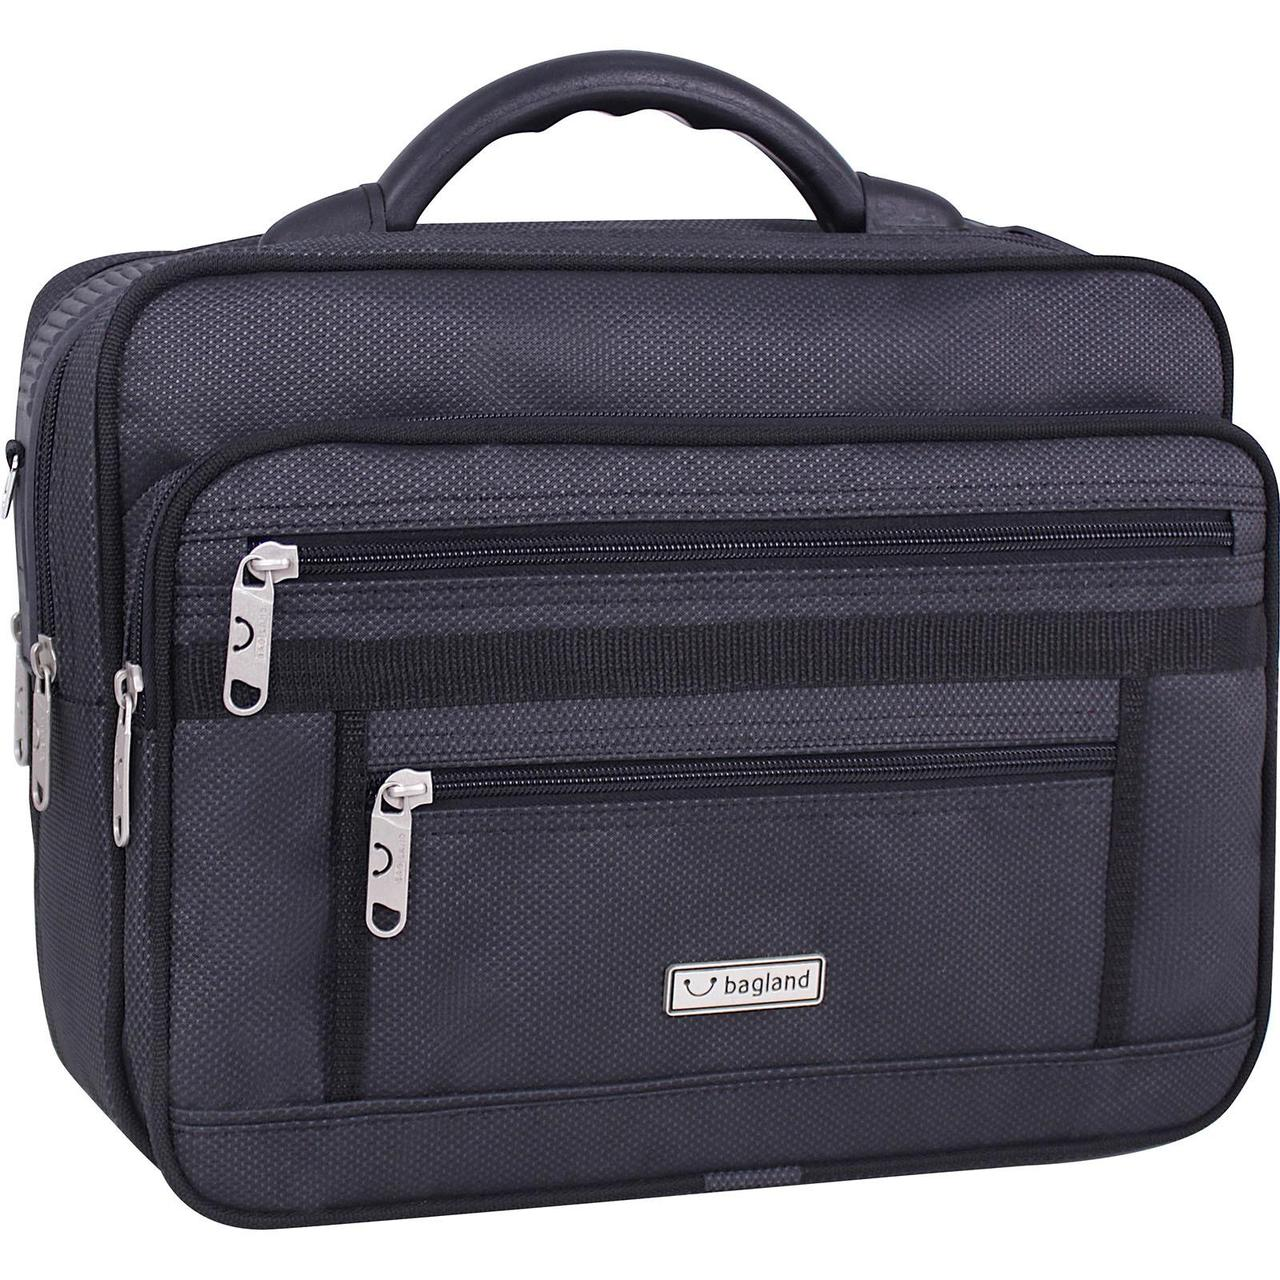 Чоловіча сумка Bagland Mr.Cool 15 л. Чорний (00251169)